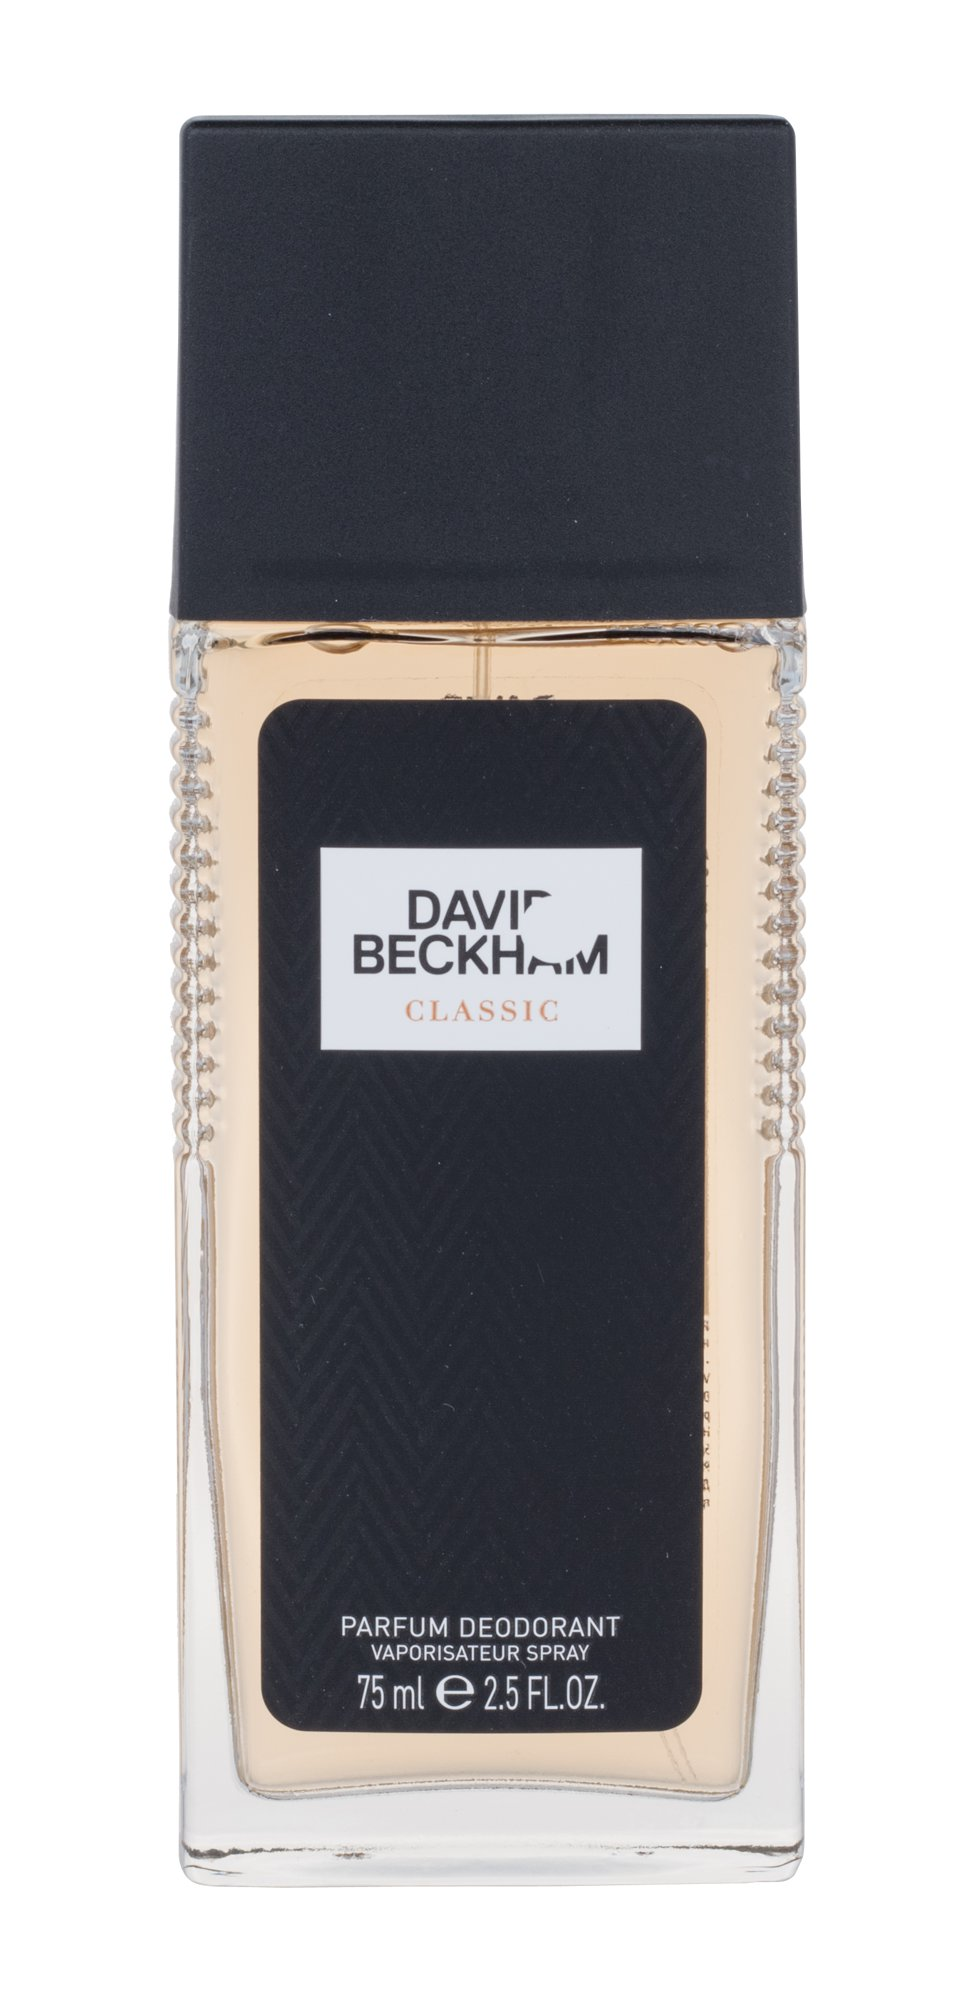 David Beckham Classic, Deodorant v skle 75ml